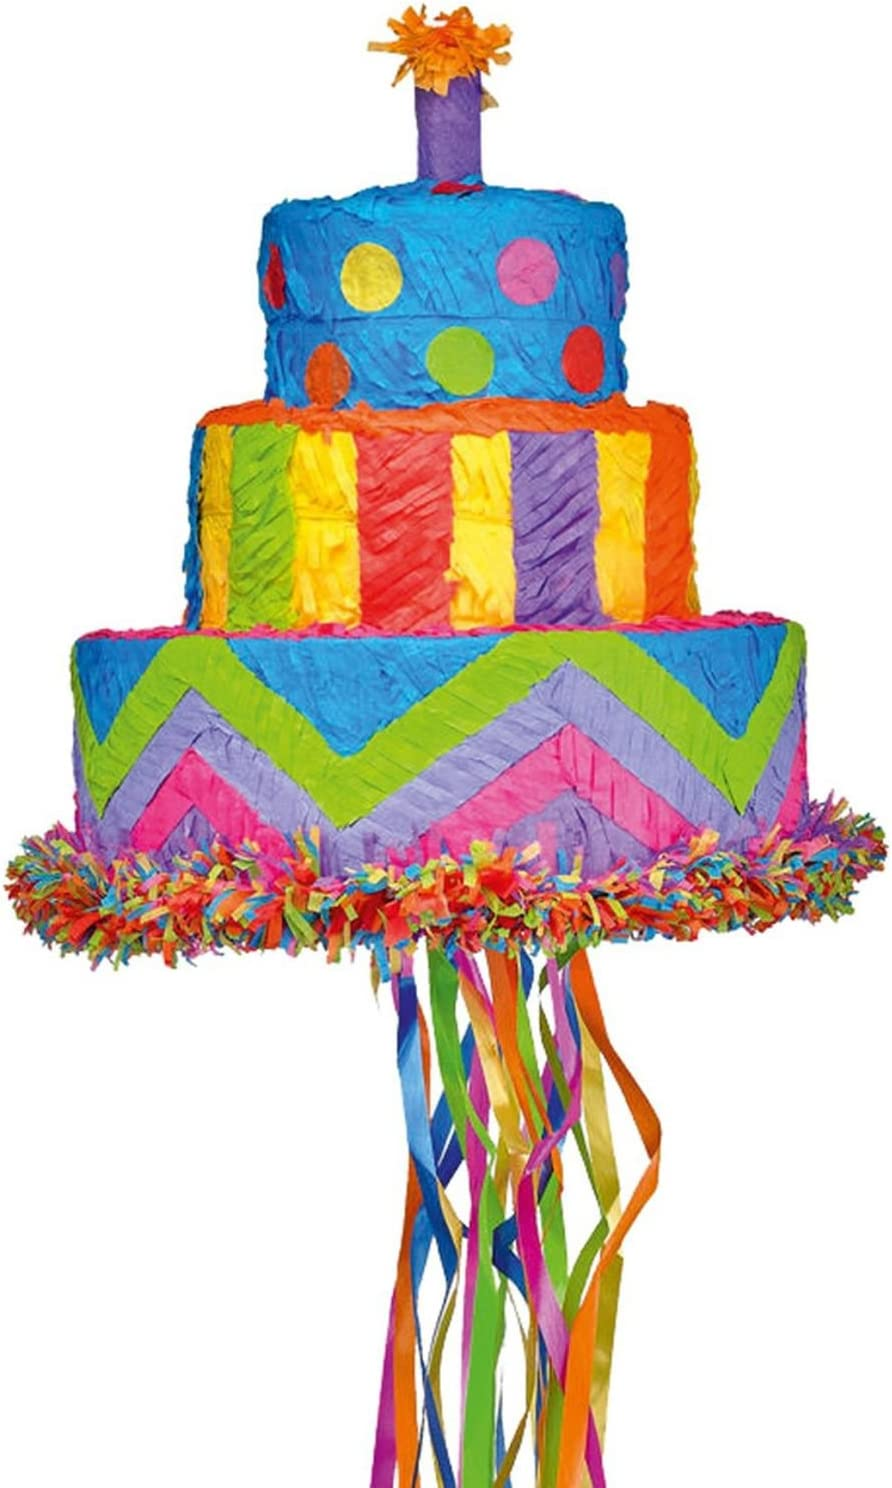 Peachy Amazon Com Amscan P19699 Accessories Pull Pinata Birthday Cake Funny Birthday Cards Online Alyptdamsfinfo